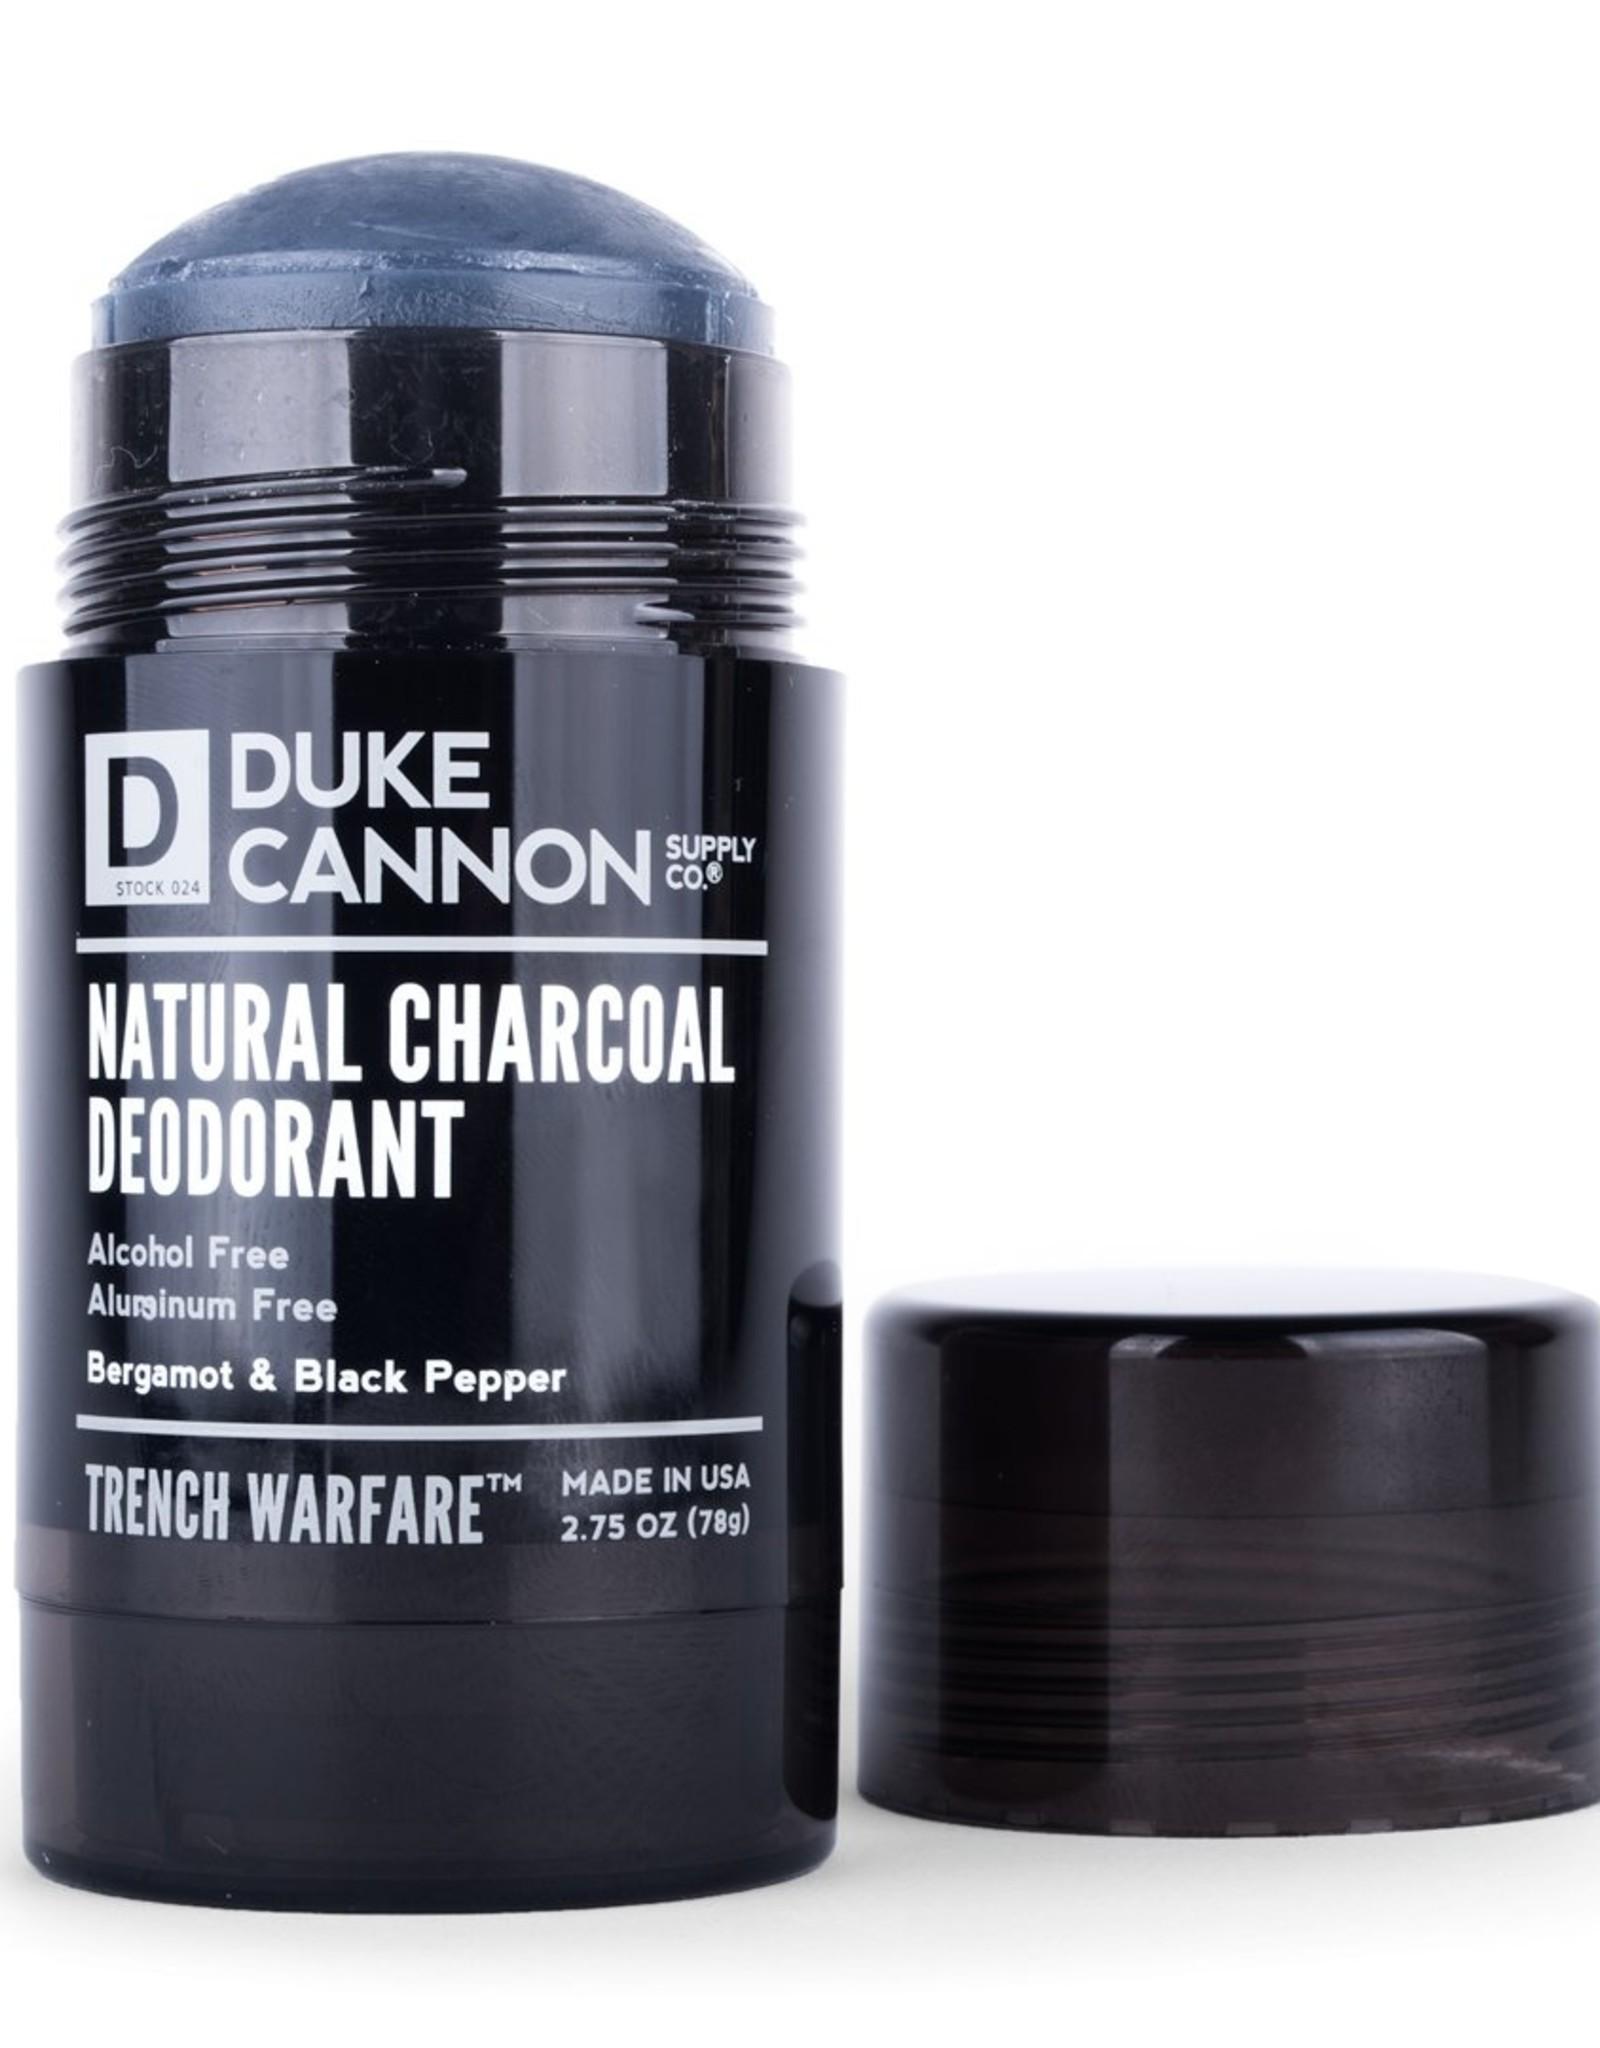 Duke Cannon  Bergamont & Black Pepper Charcoal Deodorant